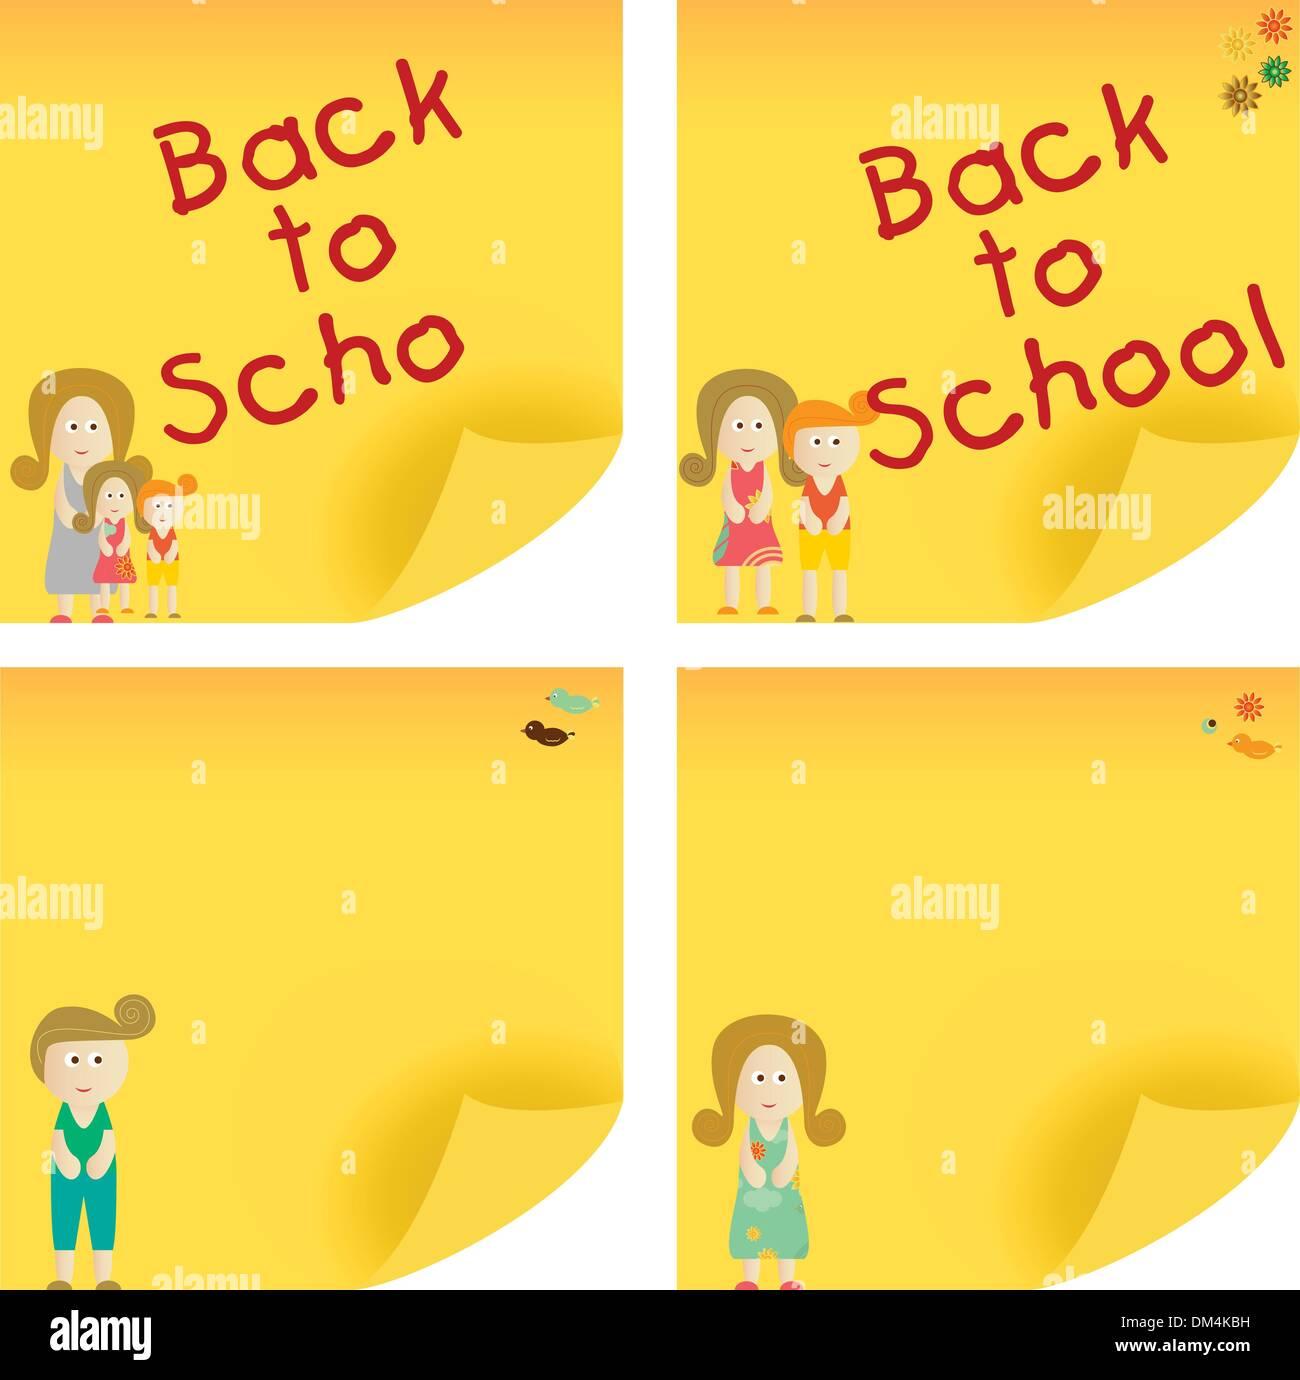 Back to School Sticky Note - Stock Image